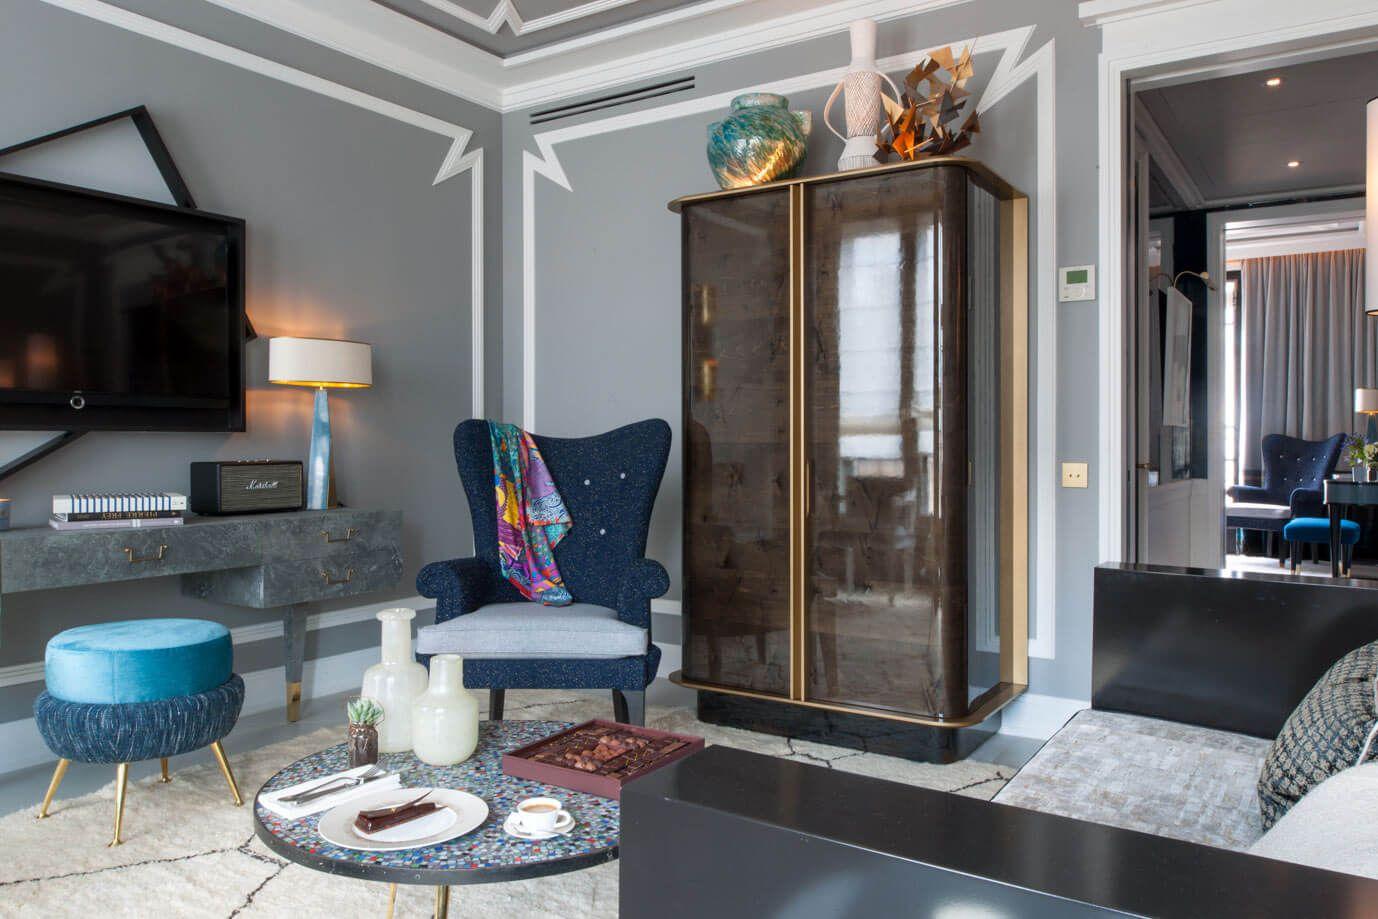 Binnenkijken in Hotel Nolinski Paris - Mixed Grill